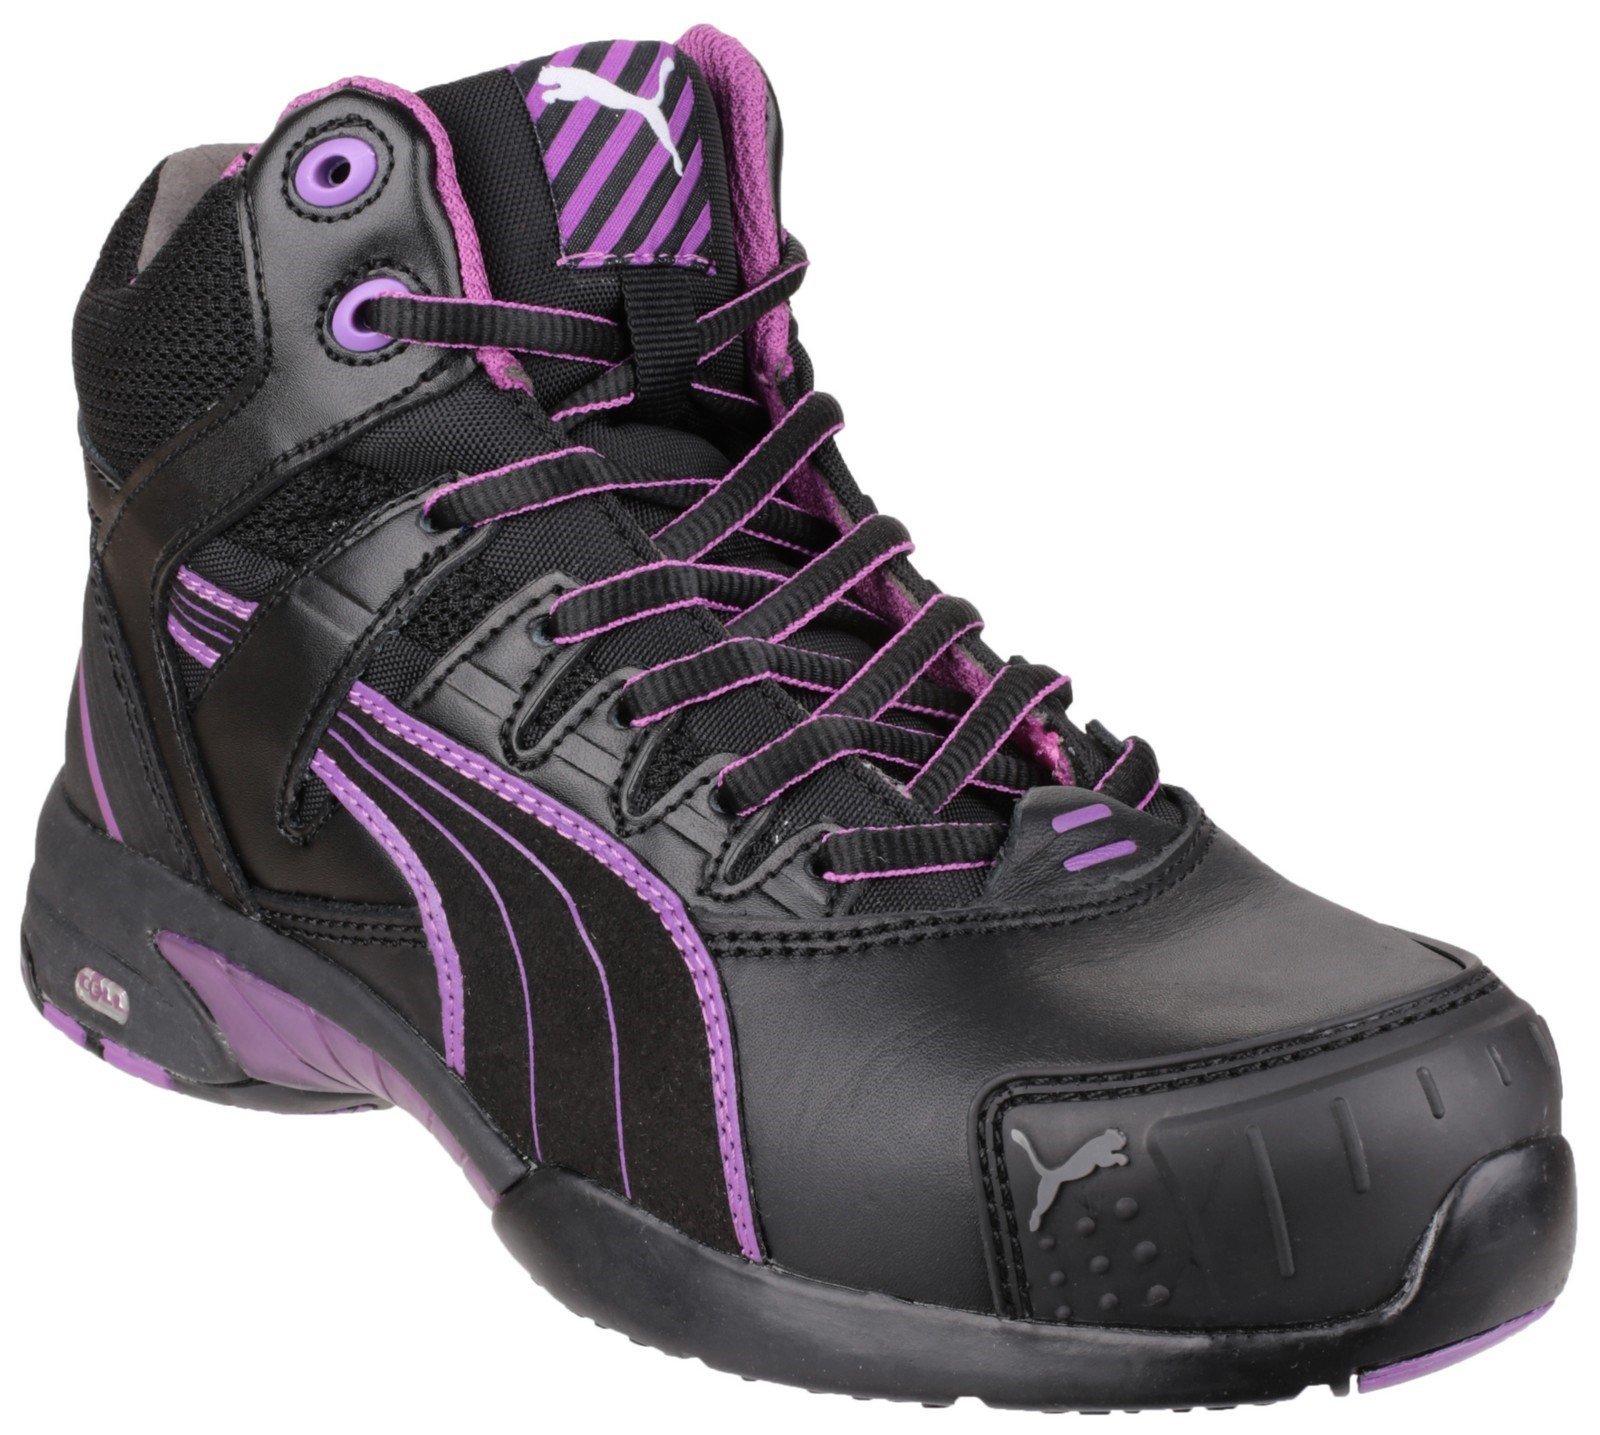 Puma Safety Women's Stepper Mid Boot Black 23088 - Black 2.5